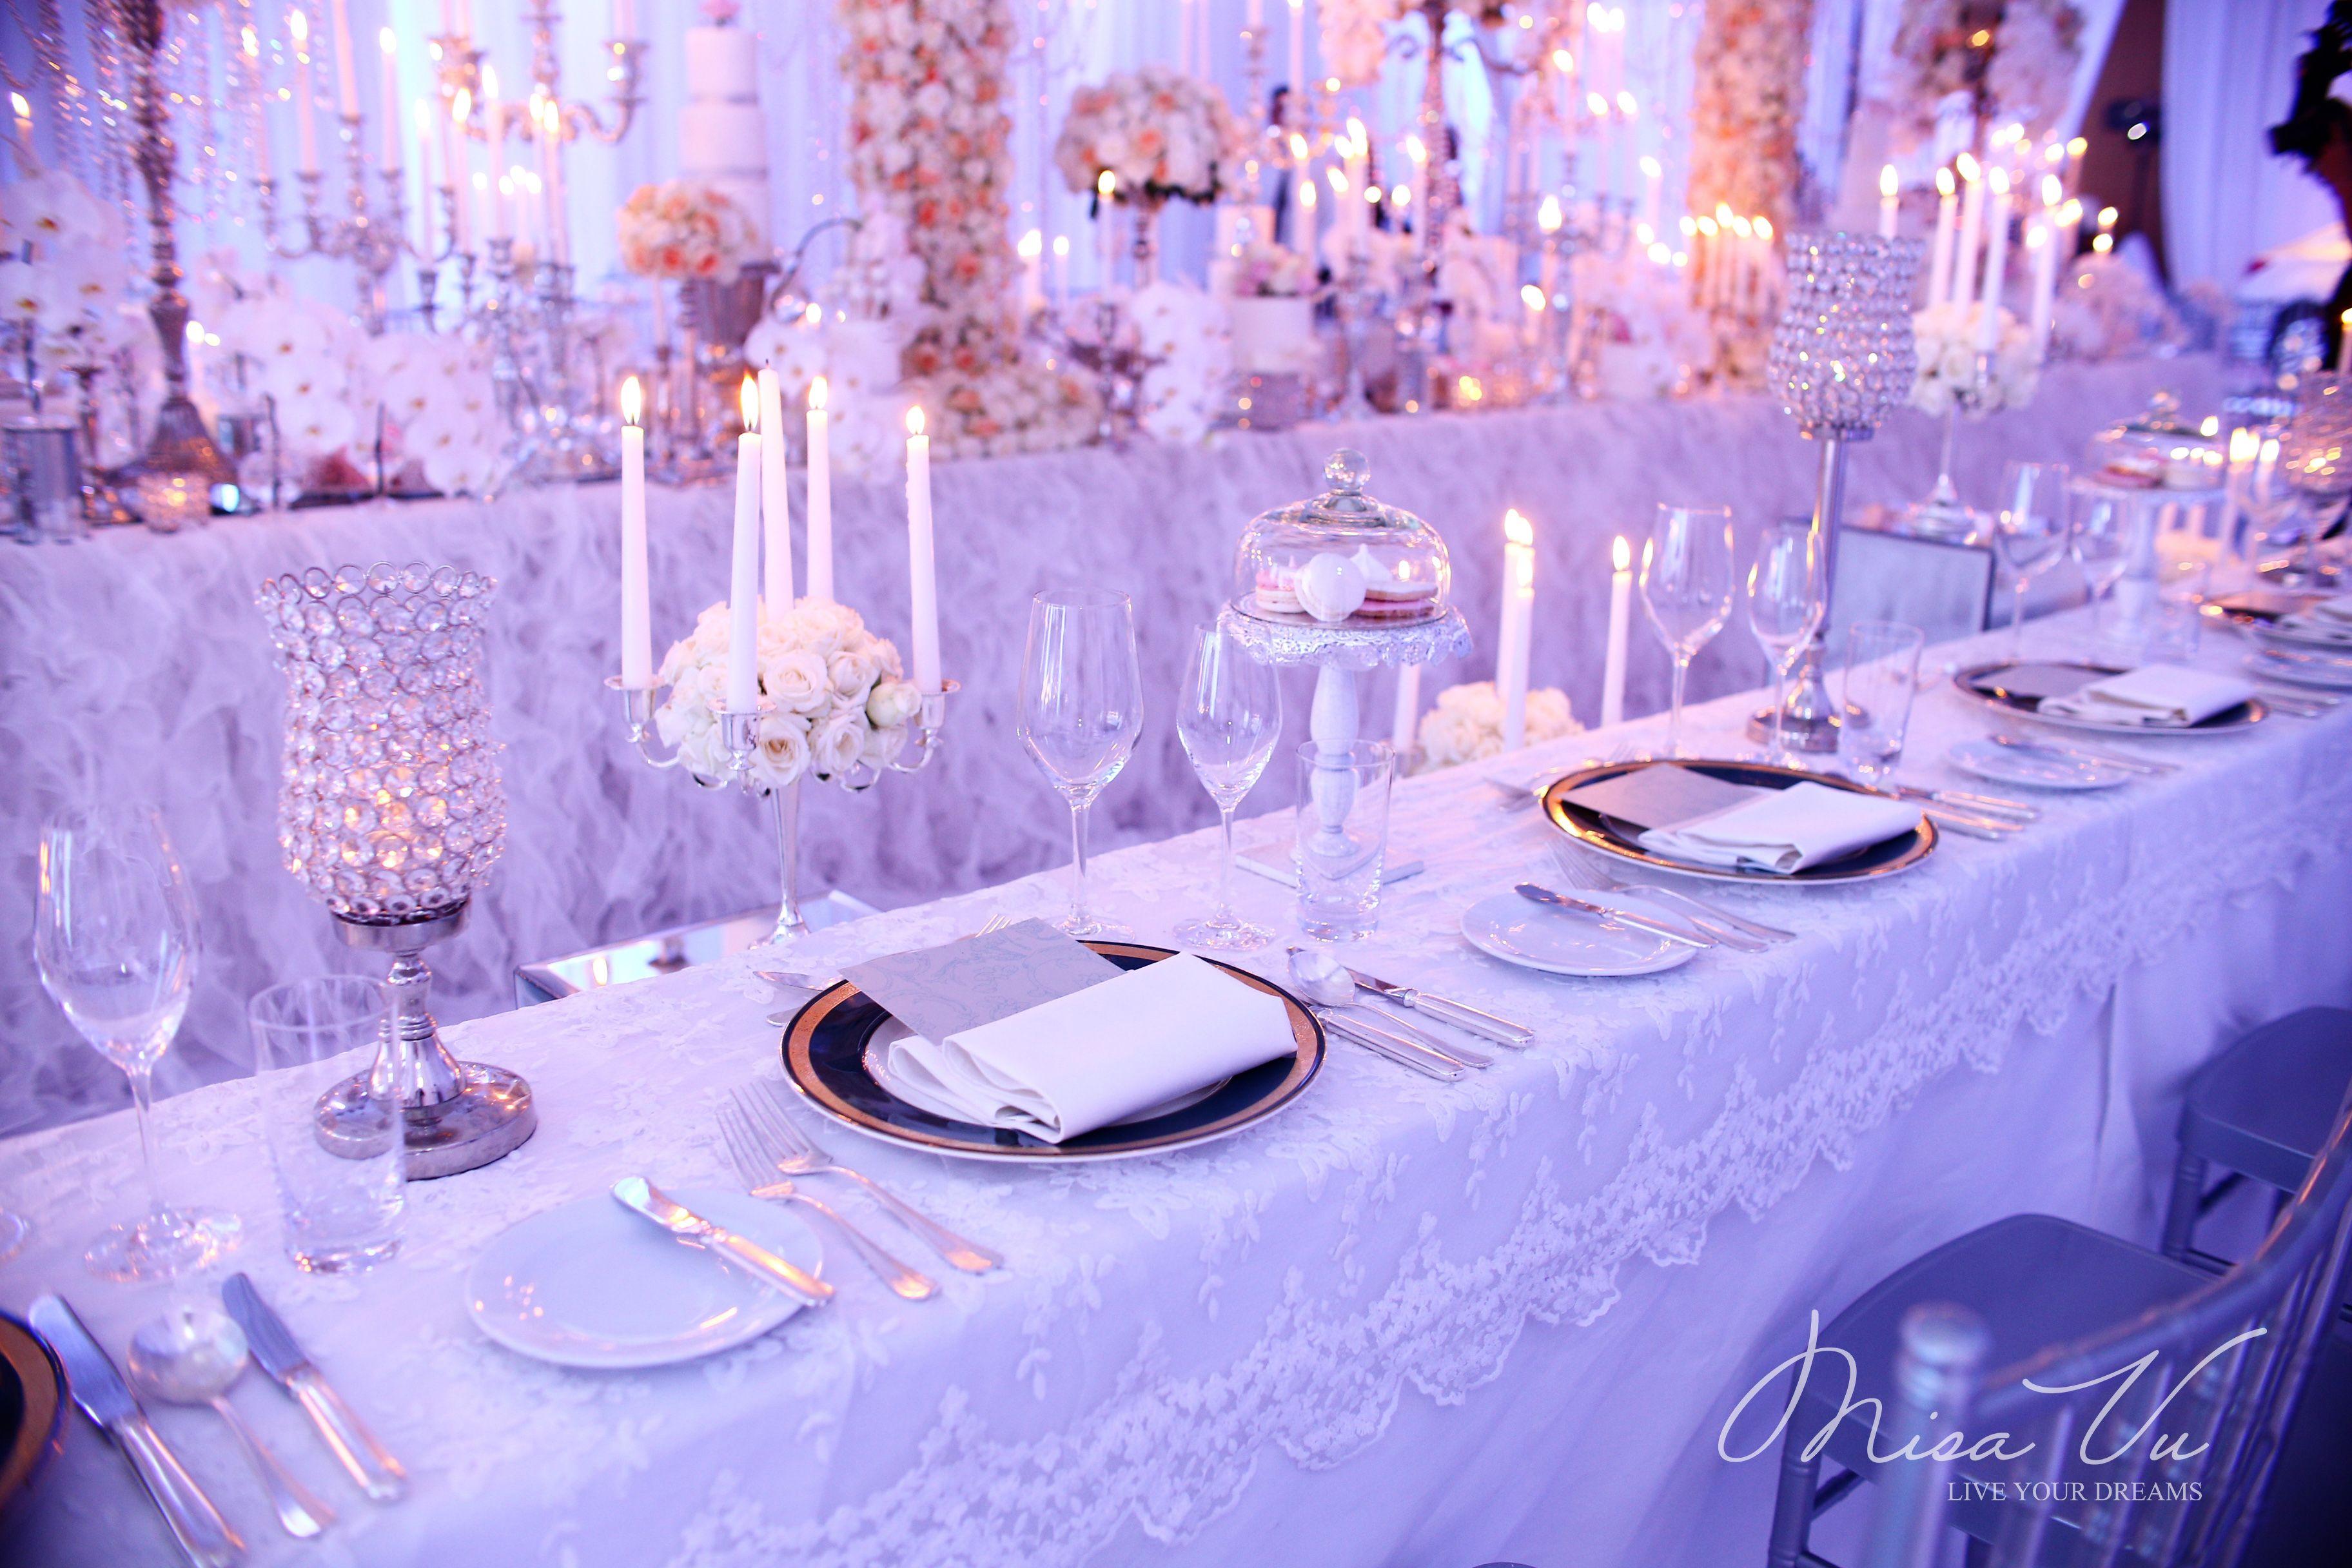 Wedding decorations for hall  Misa Vu  Wedding decorations idea  Pinterest  Wedding and Weddings